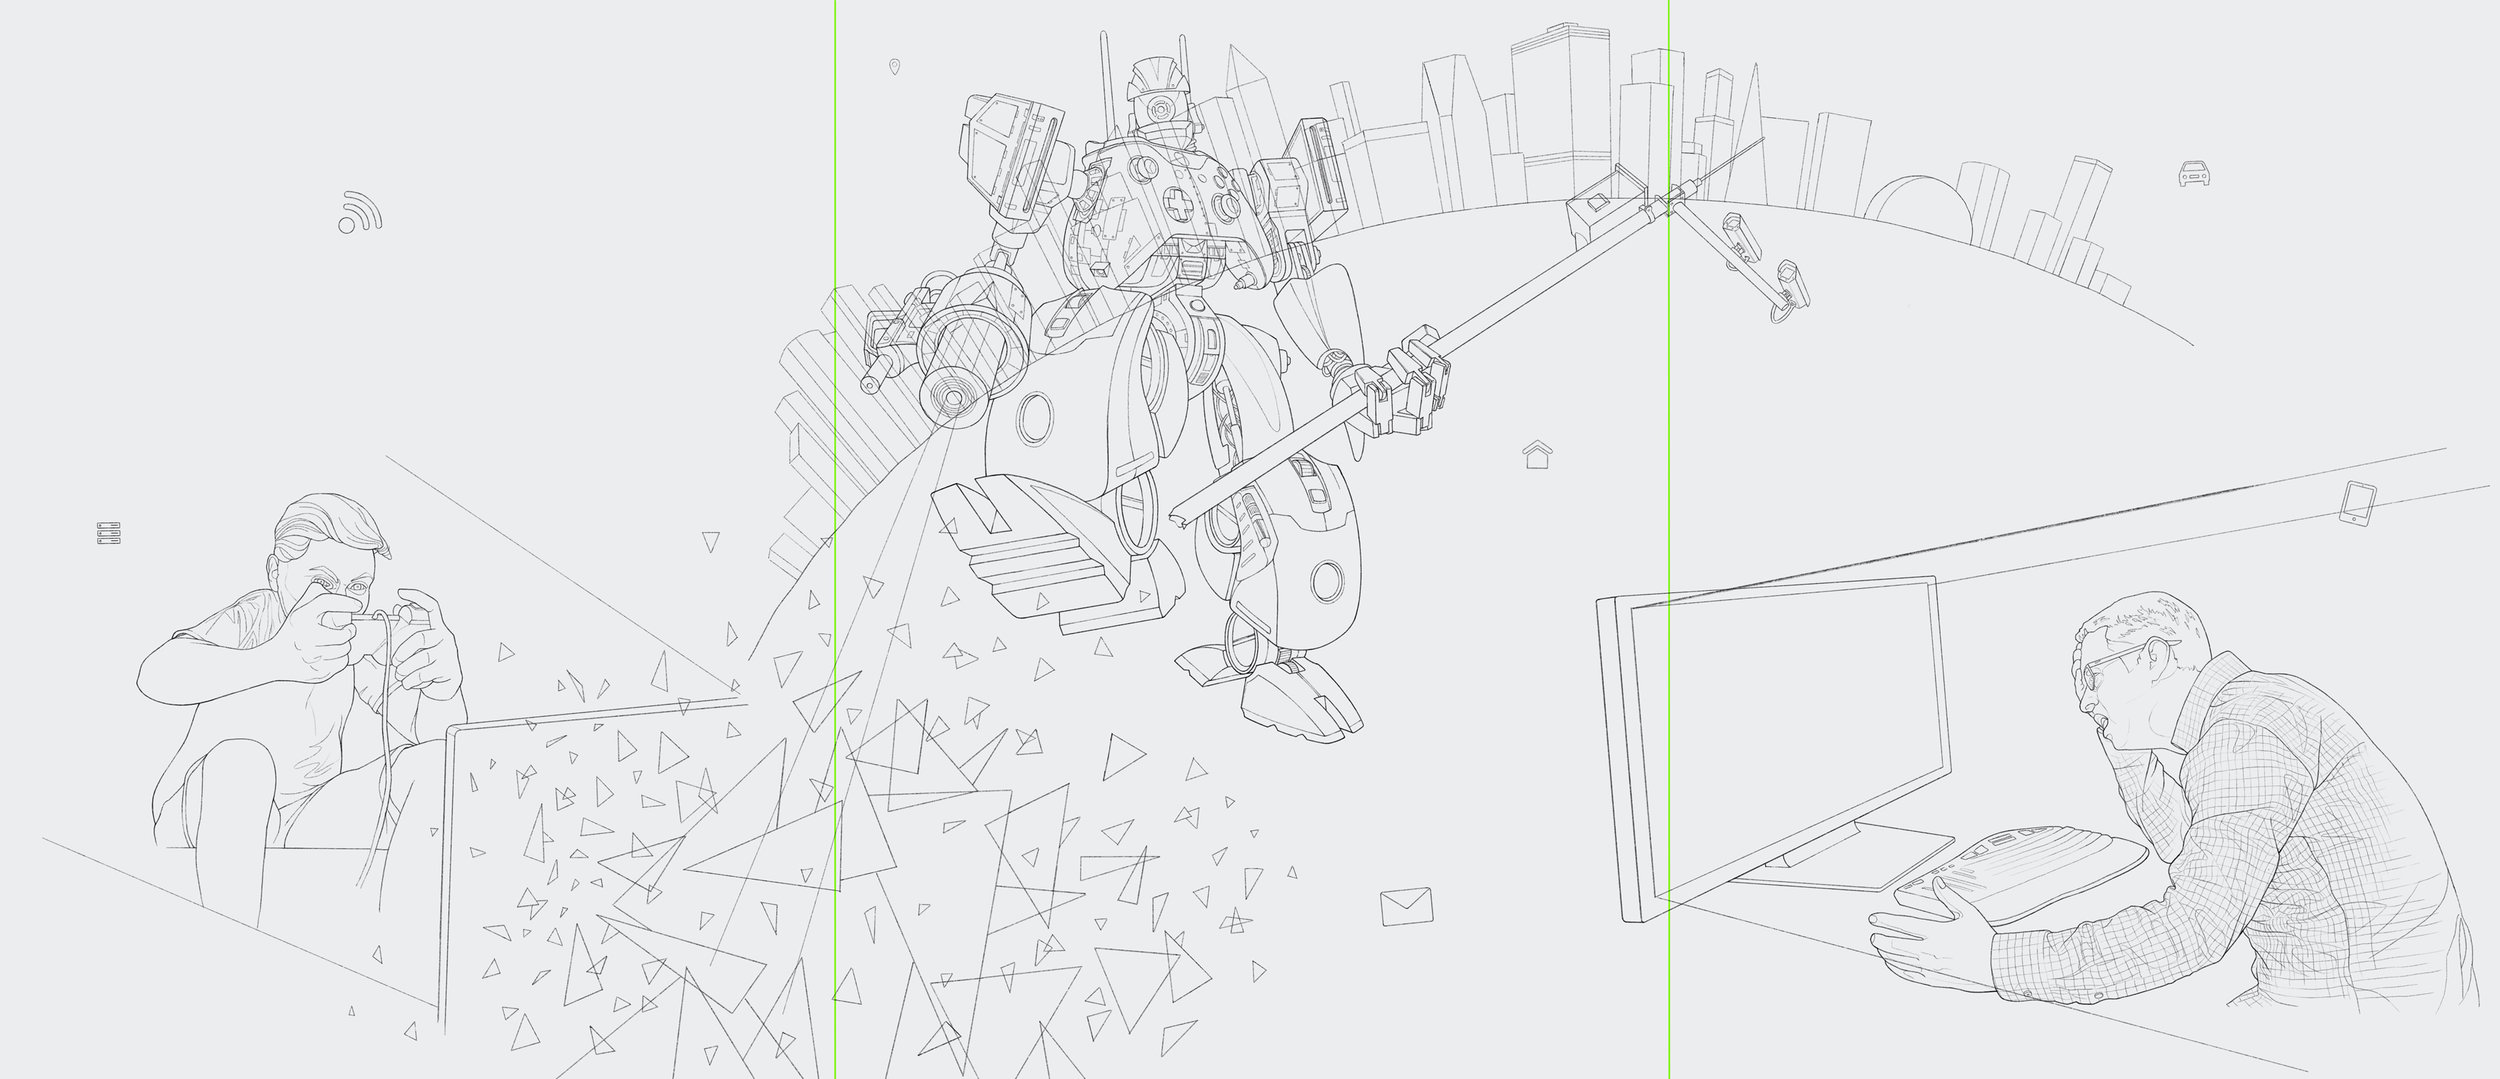 Teen_Attacker_Final_Line-2-lineart-fpo.jpg